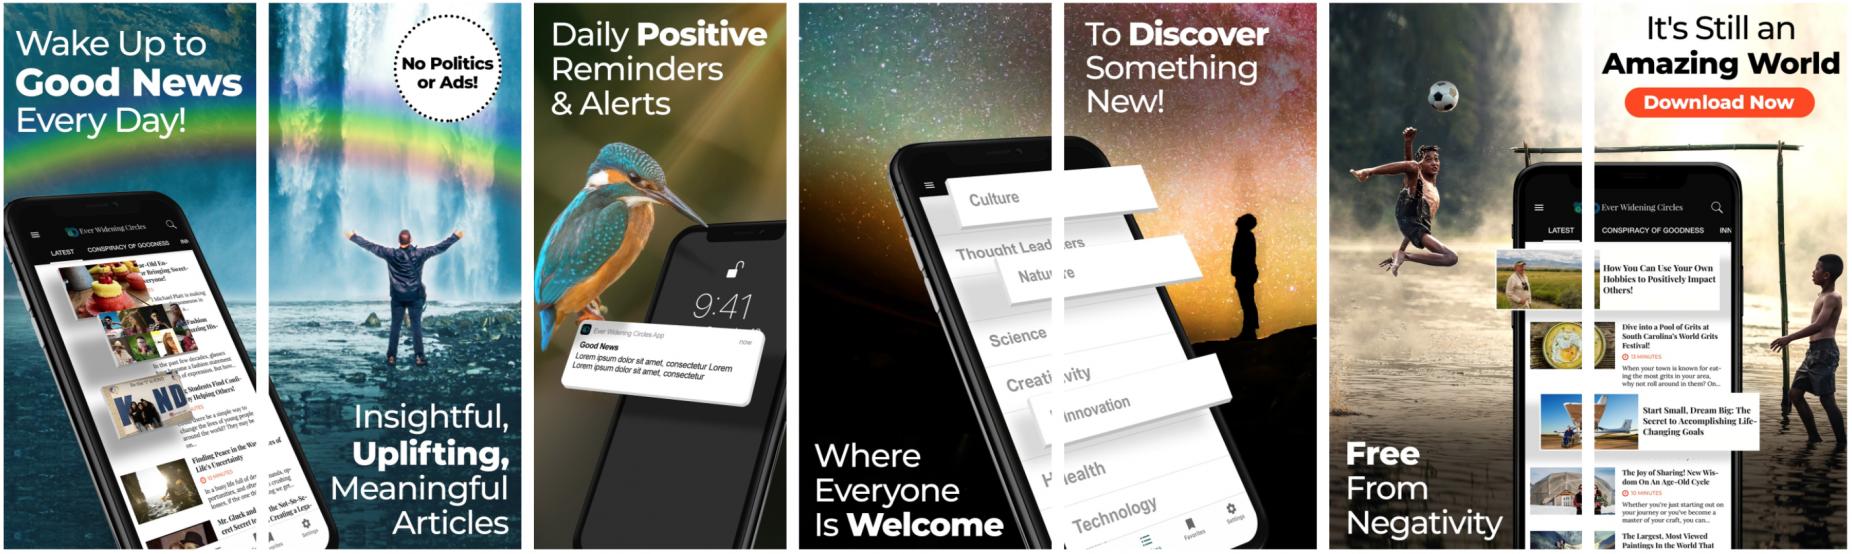 Image: Screen shots of the EWC app